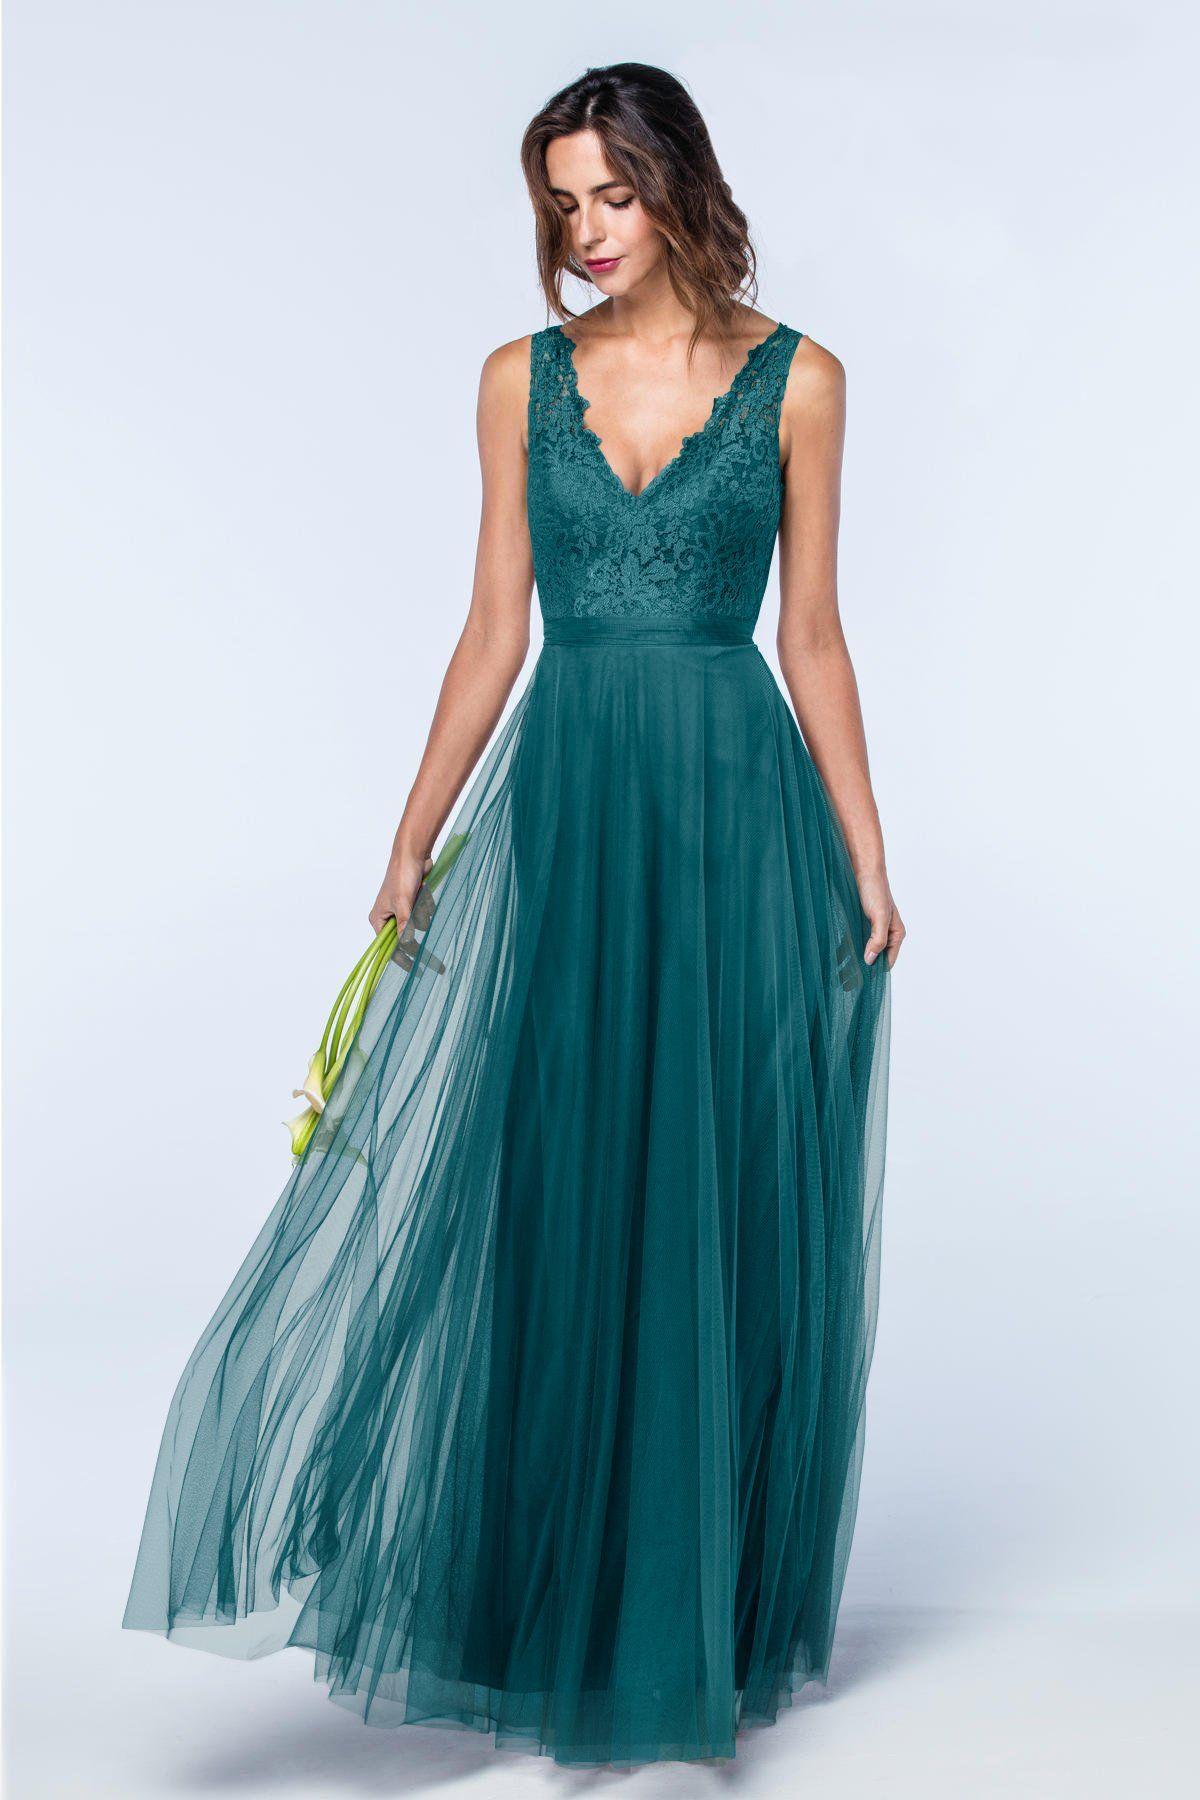 Desiree fall bridesmaid dress 2017 shade of green lakeway desiree fall bridesmaid dress 2017 shade of green ombrellifo Choice Image